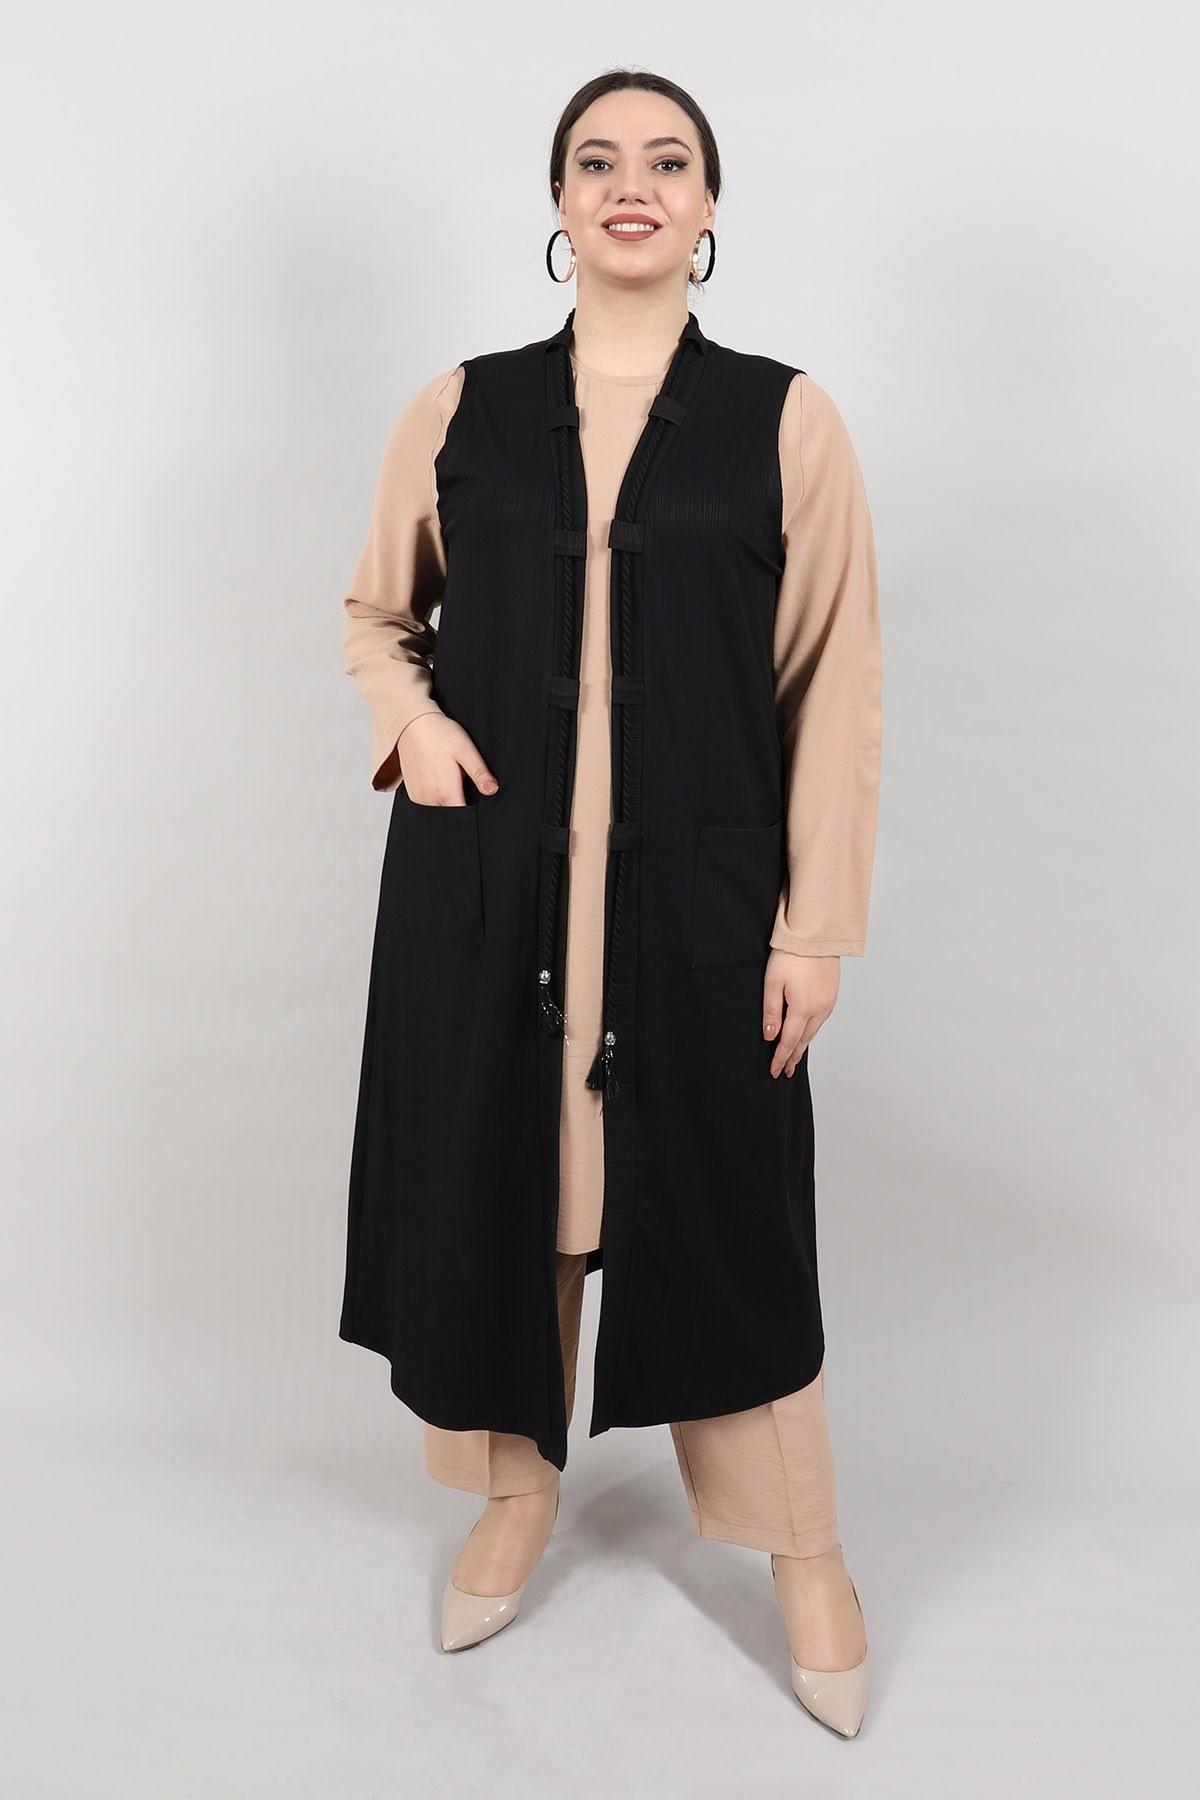 Plus Size Vest KadoModa Black